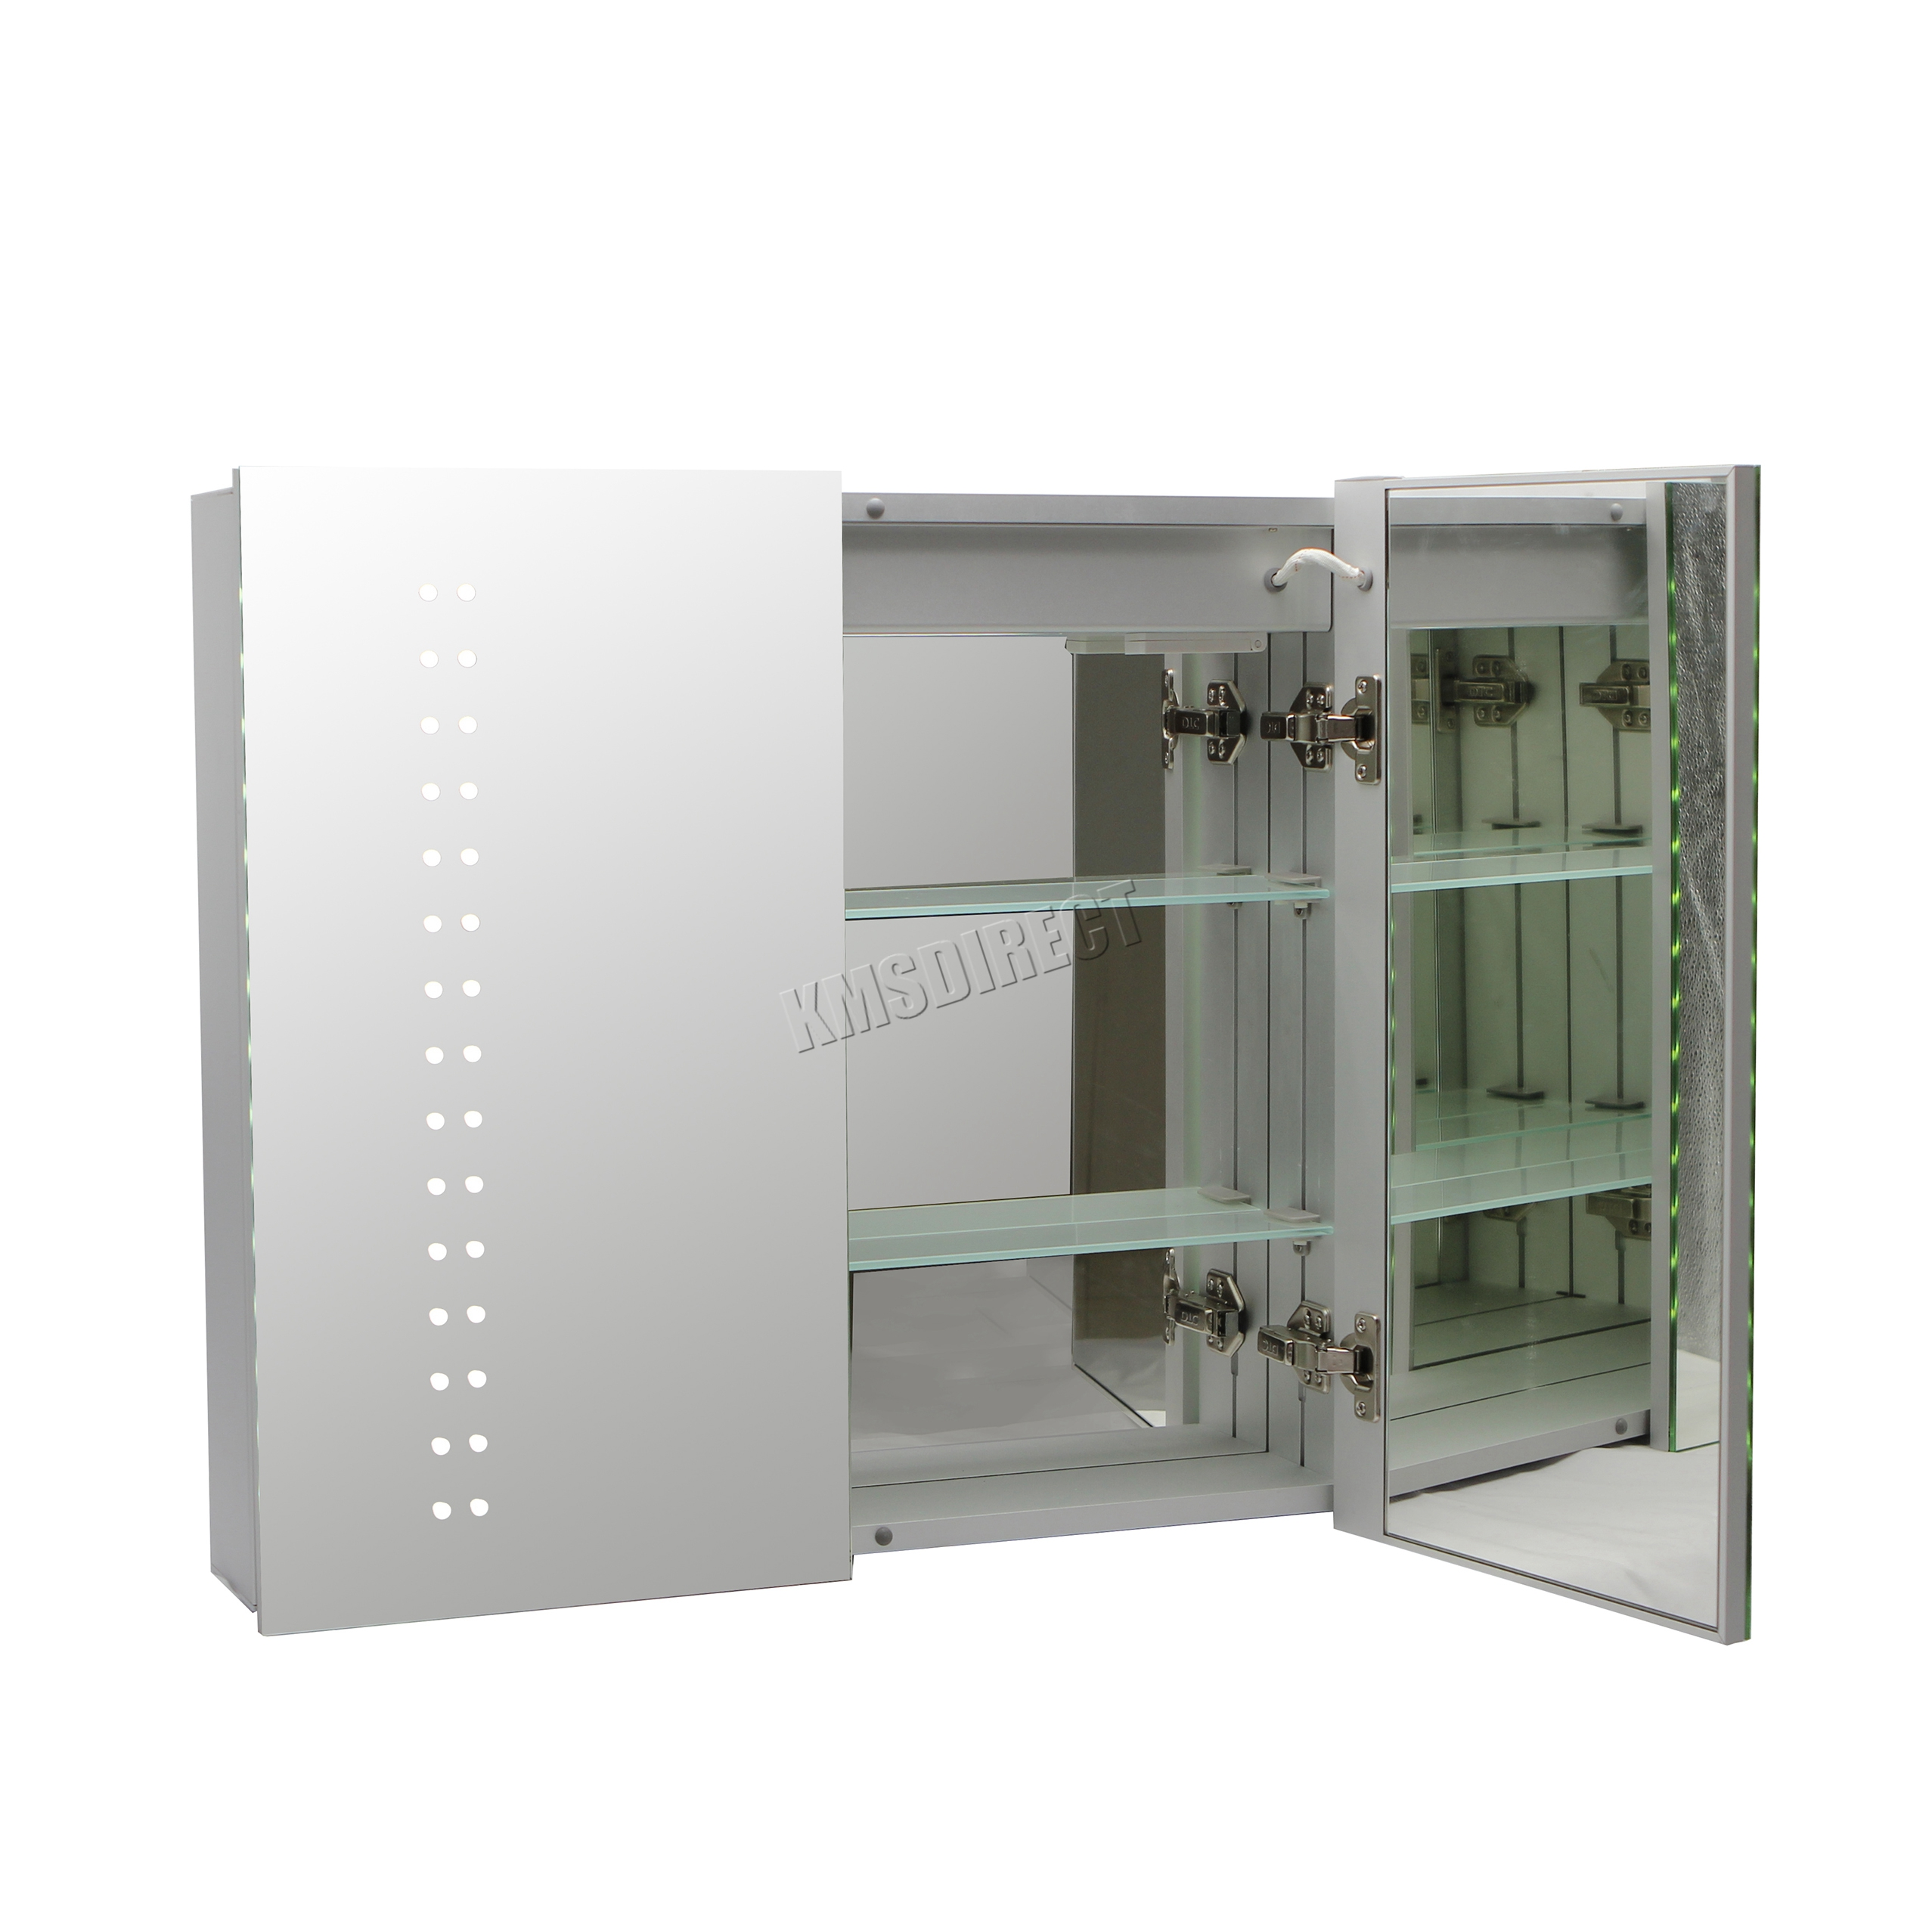 FoxHunter 2 Doors Wall Mount LED Illuminated Mirror Bathroom Cabinet Unit MC20